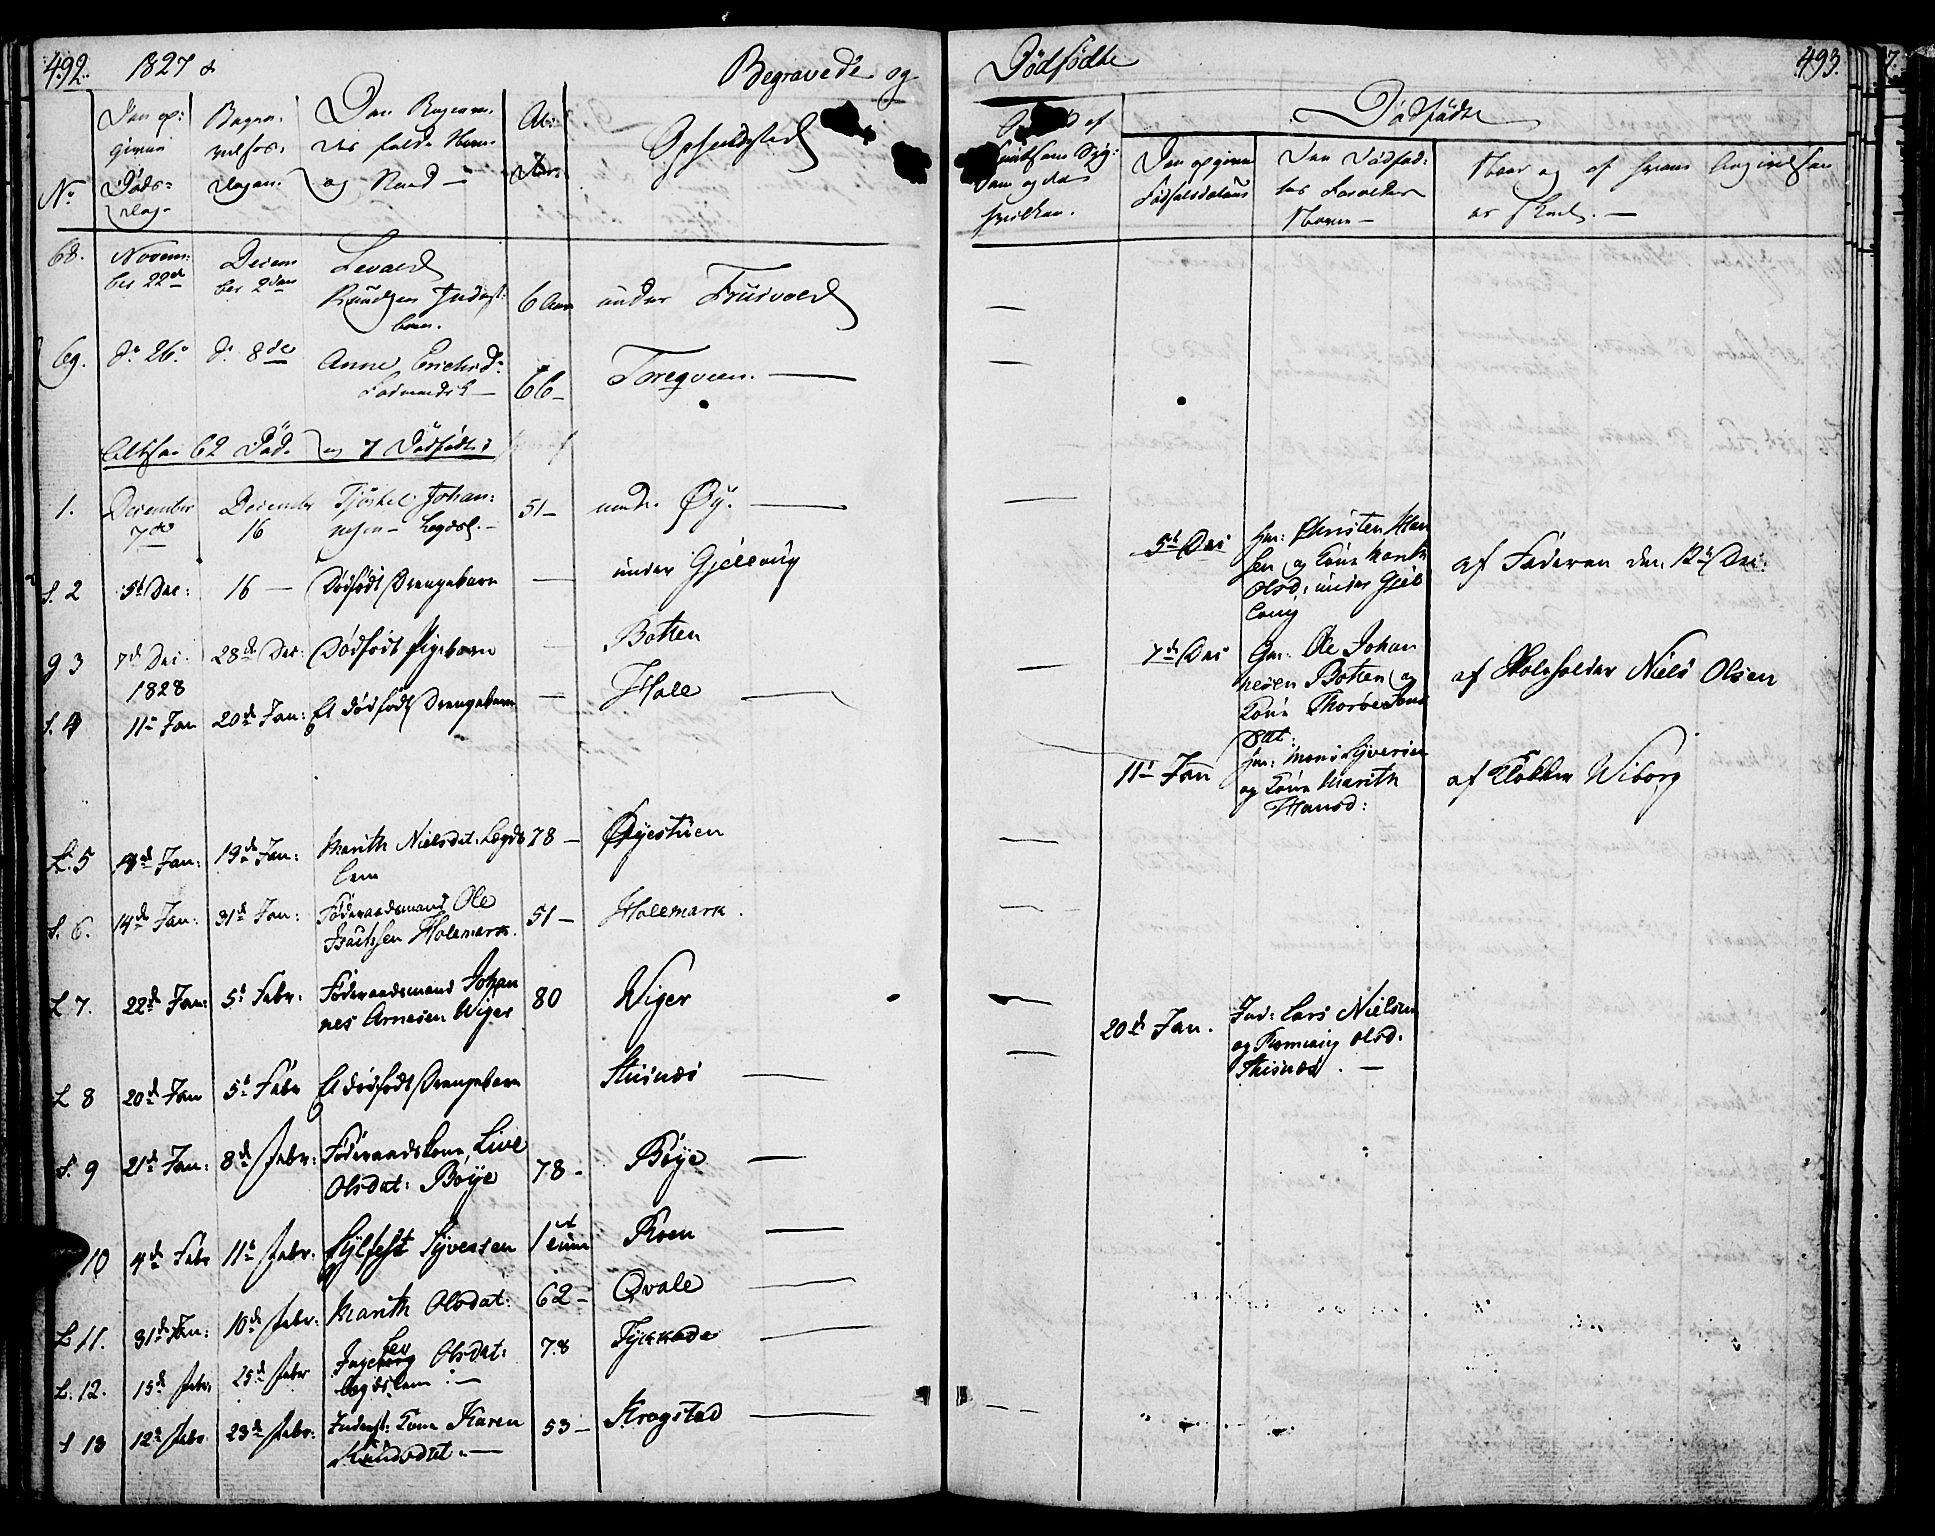 SAH, Lom prestekontor, K/L0005: Parish register (official) no. 5, 1825-1837, p. 492-493